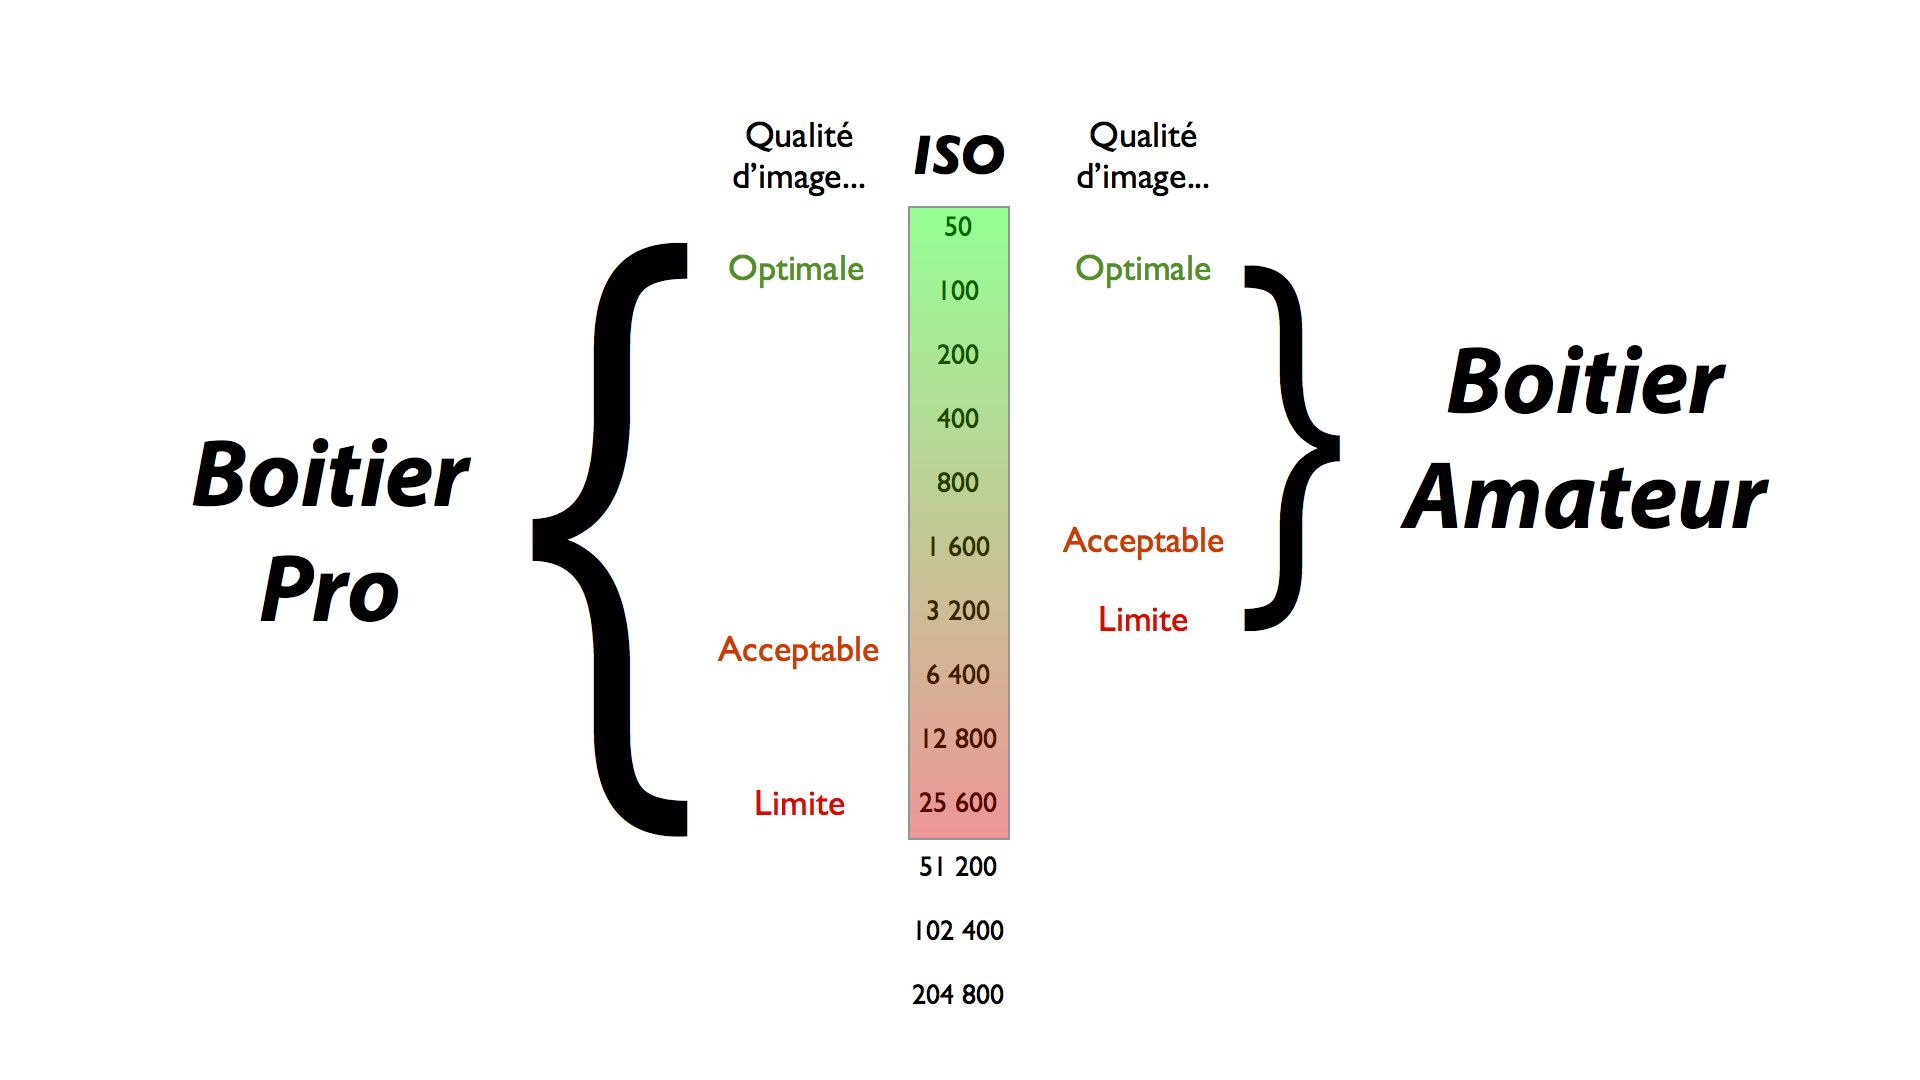 ISO et QUALITE d'IMAGE.001